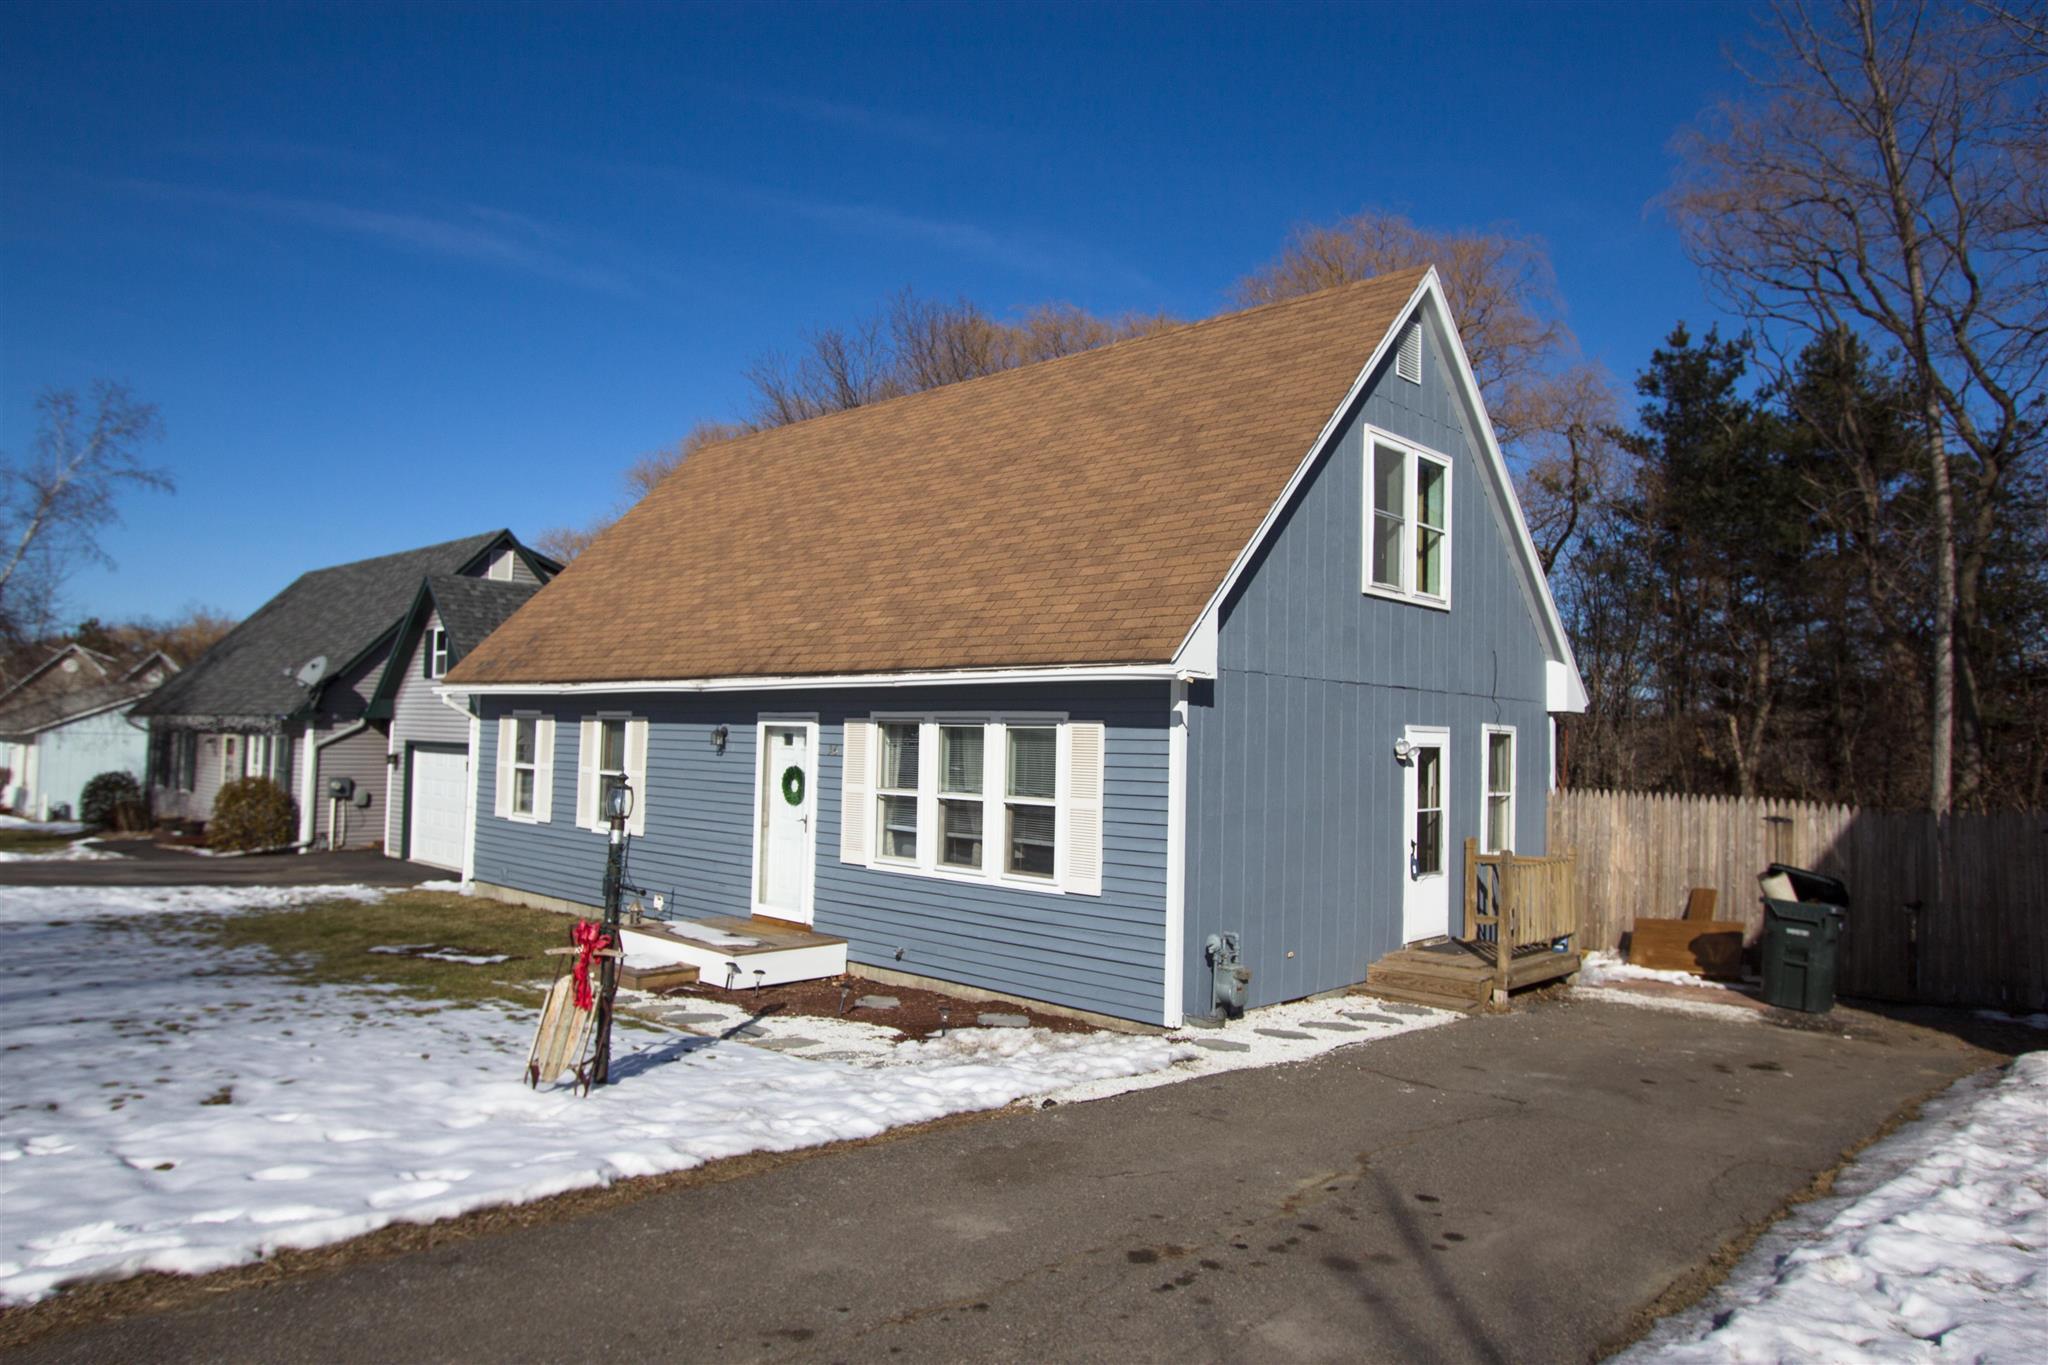 Robert Foley Flat Fee Real Estate Agent In Burlington Vt New Hampshire Vermont